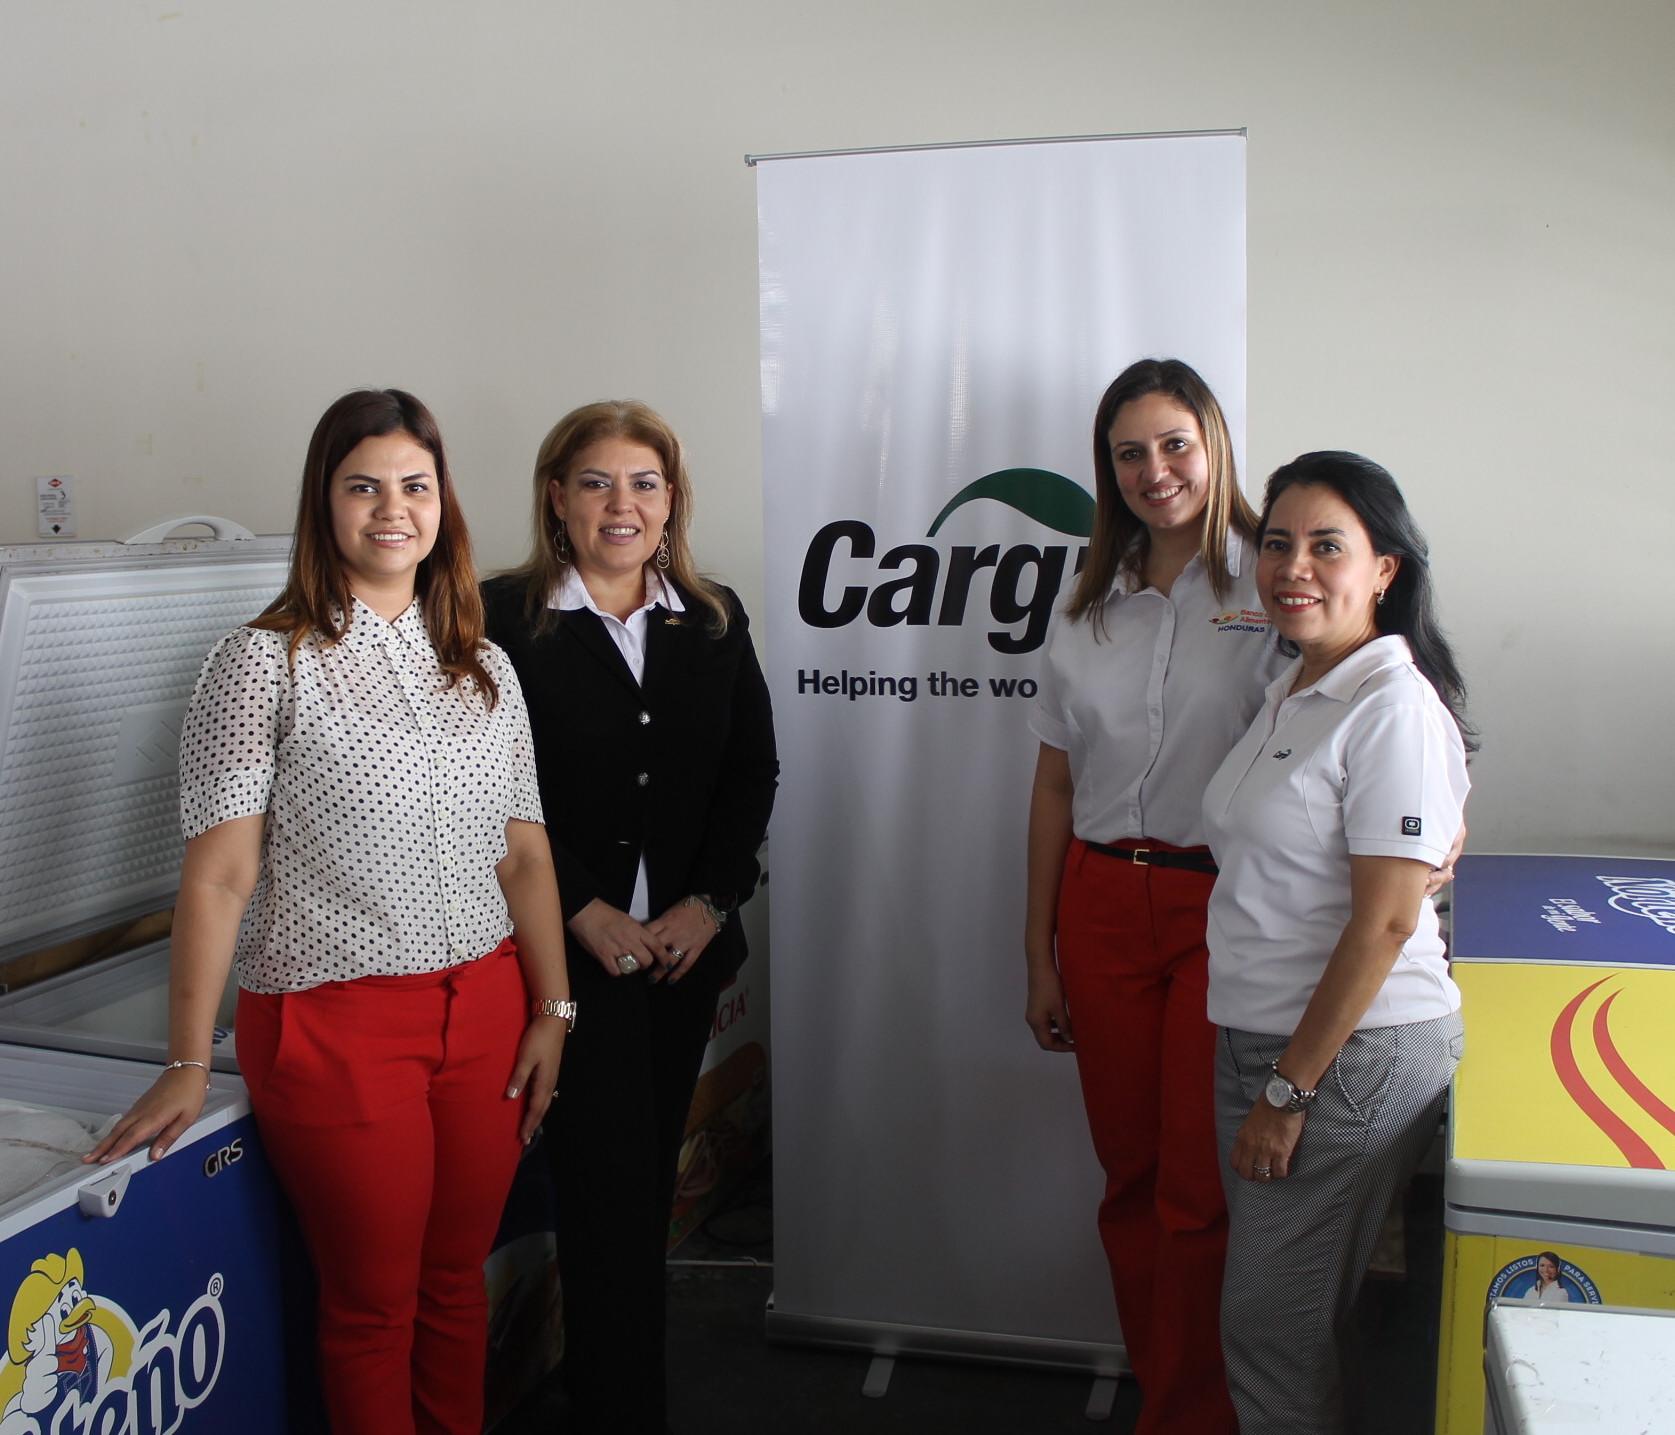 Linda Marin de BAH, Blanca Villela de Cargill, xx y Liliana Barahona de Cargill.